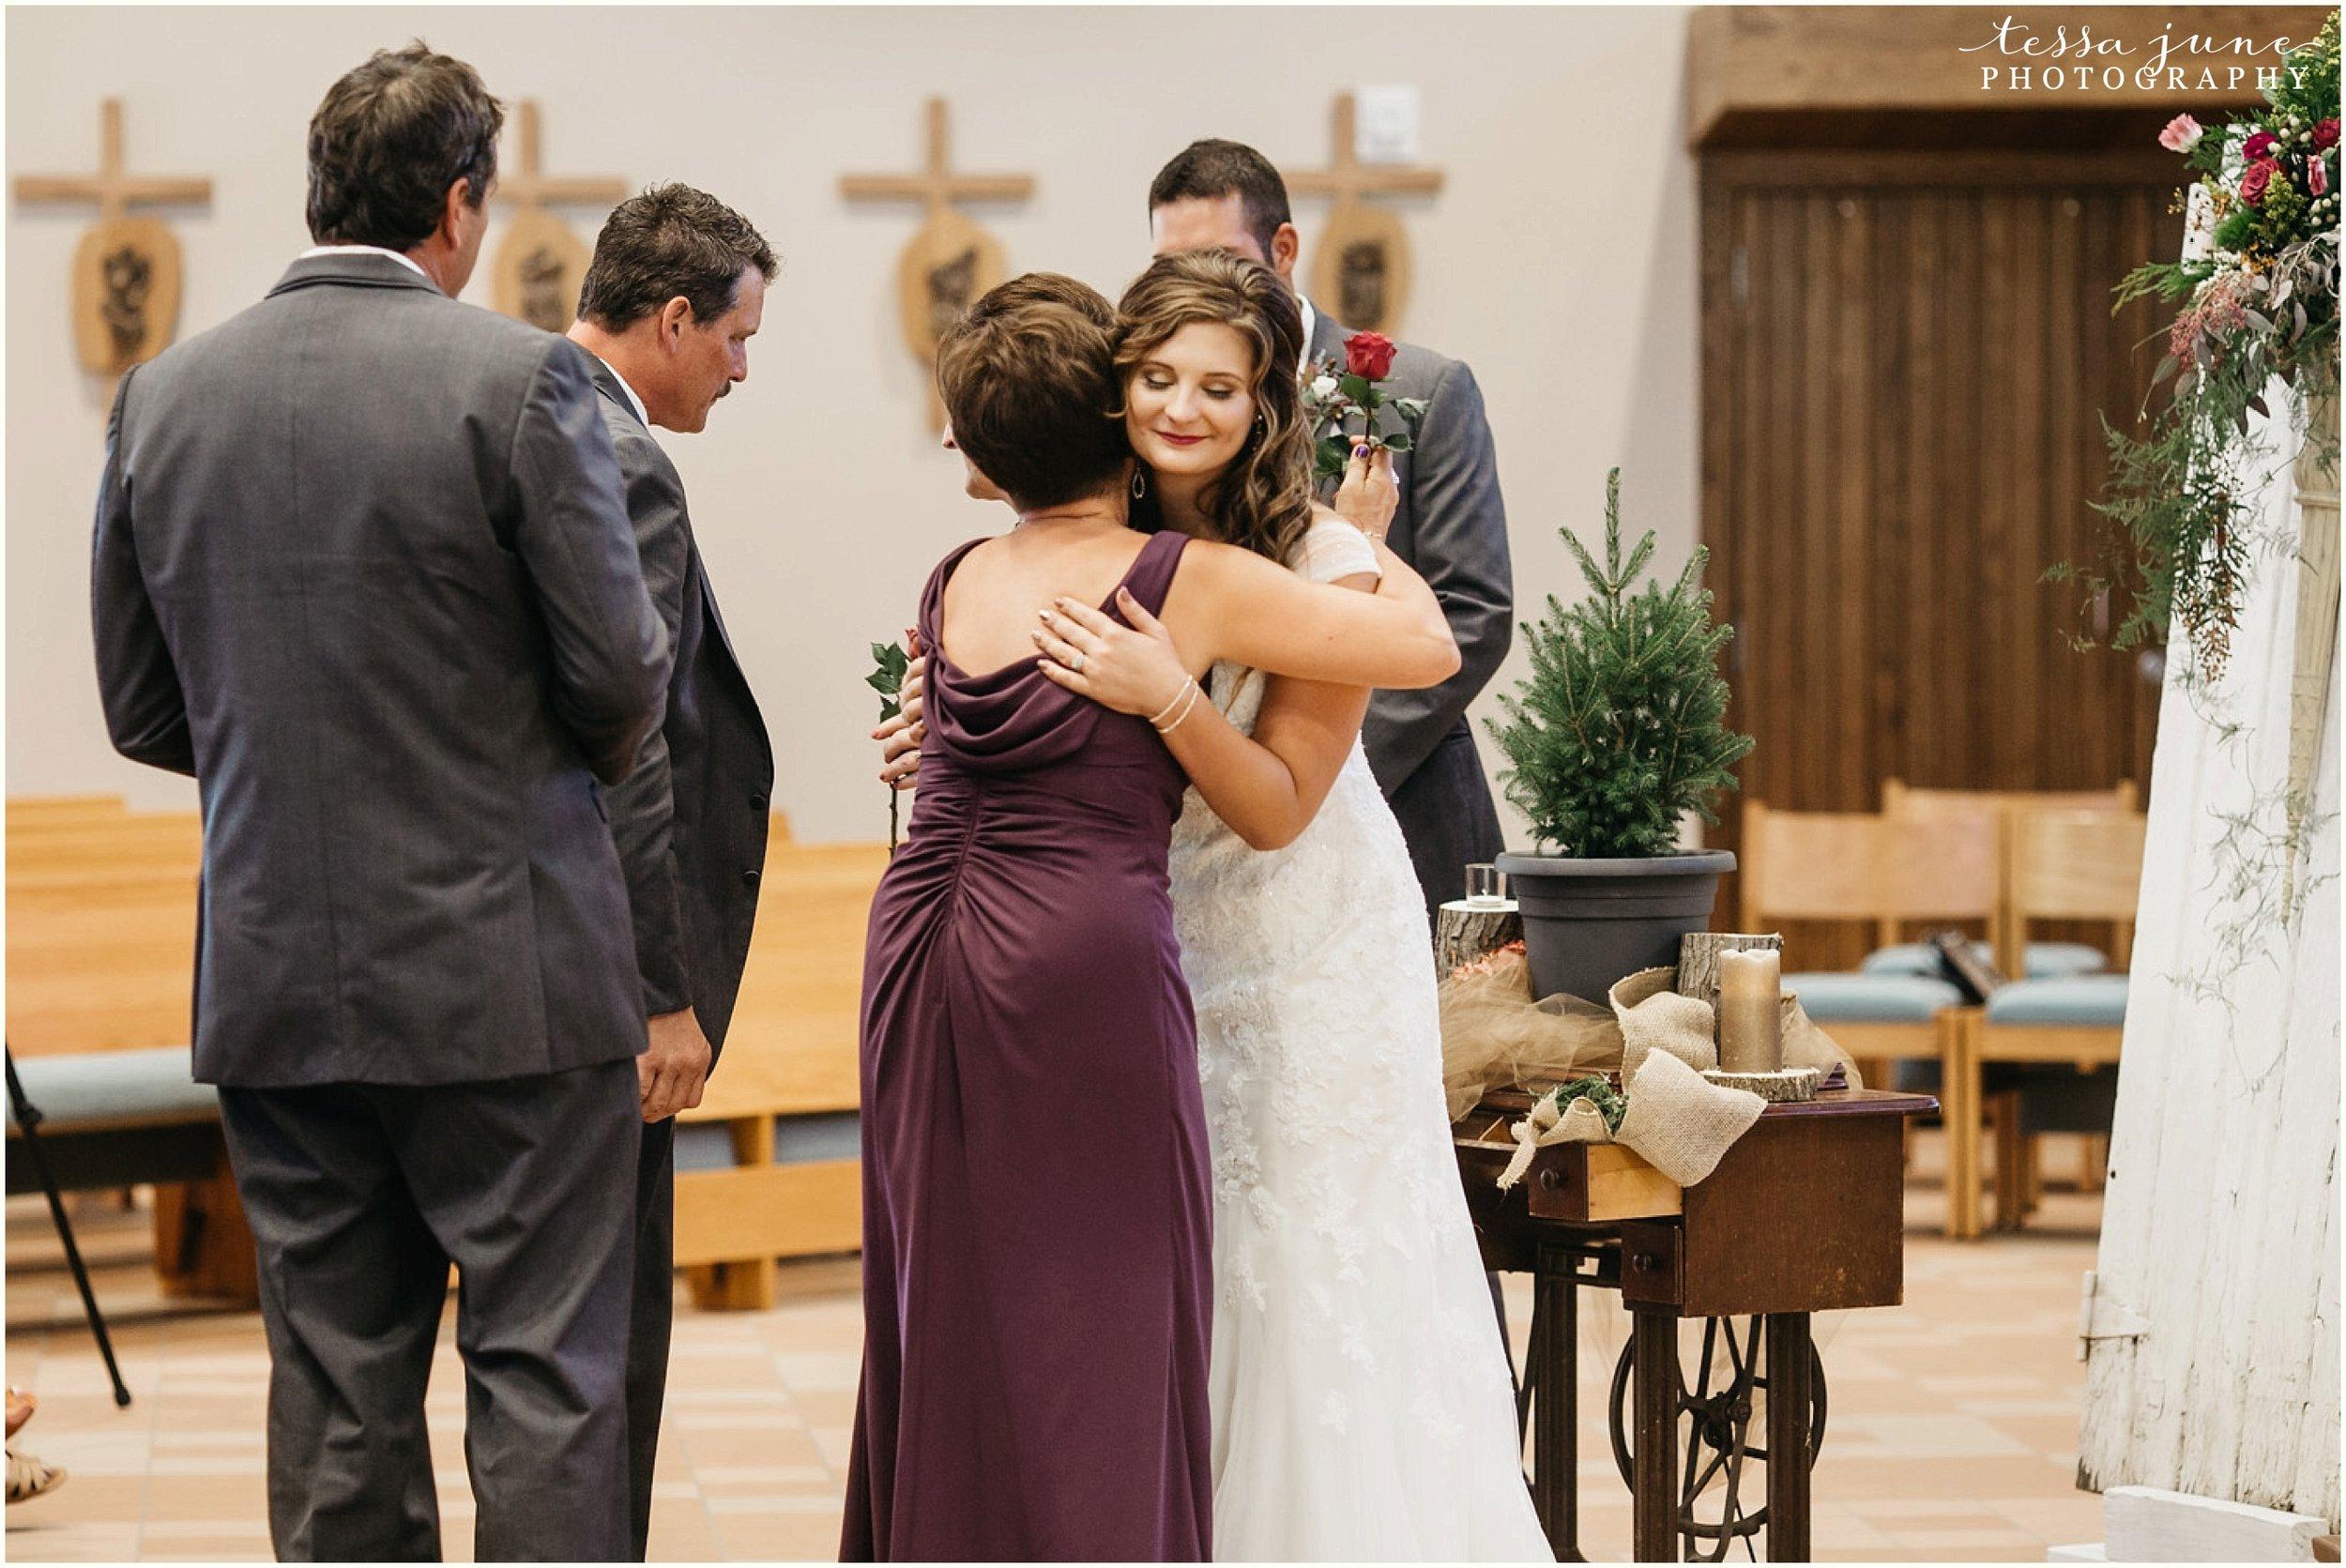 bohemian-minnesota-wedding-mismatched-bridesmaid-dresses-waterfall-st-cloud-tessa-june-photography-110.jpg